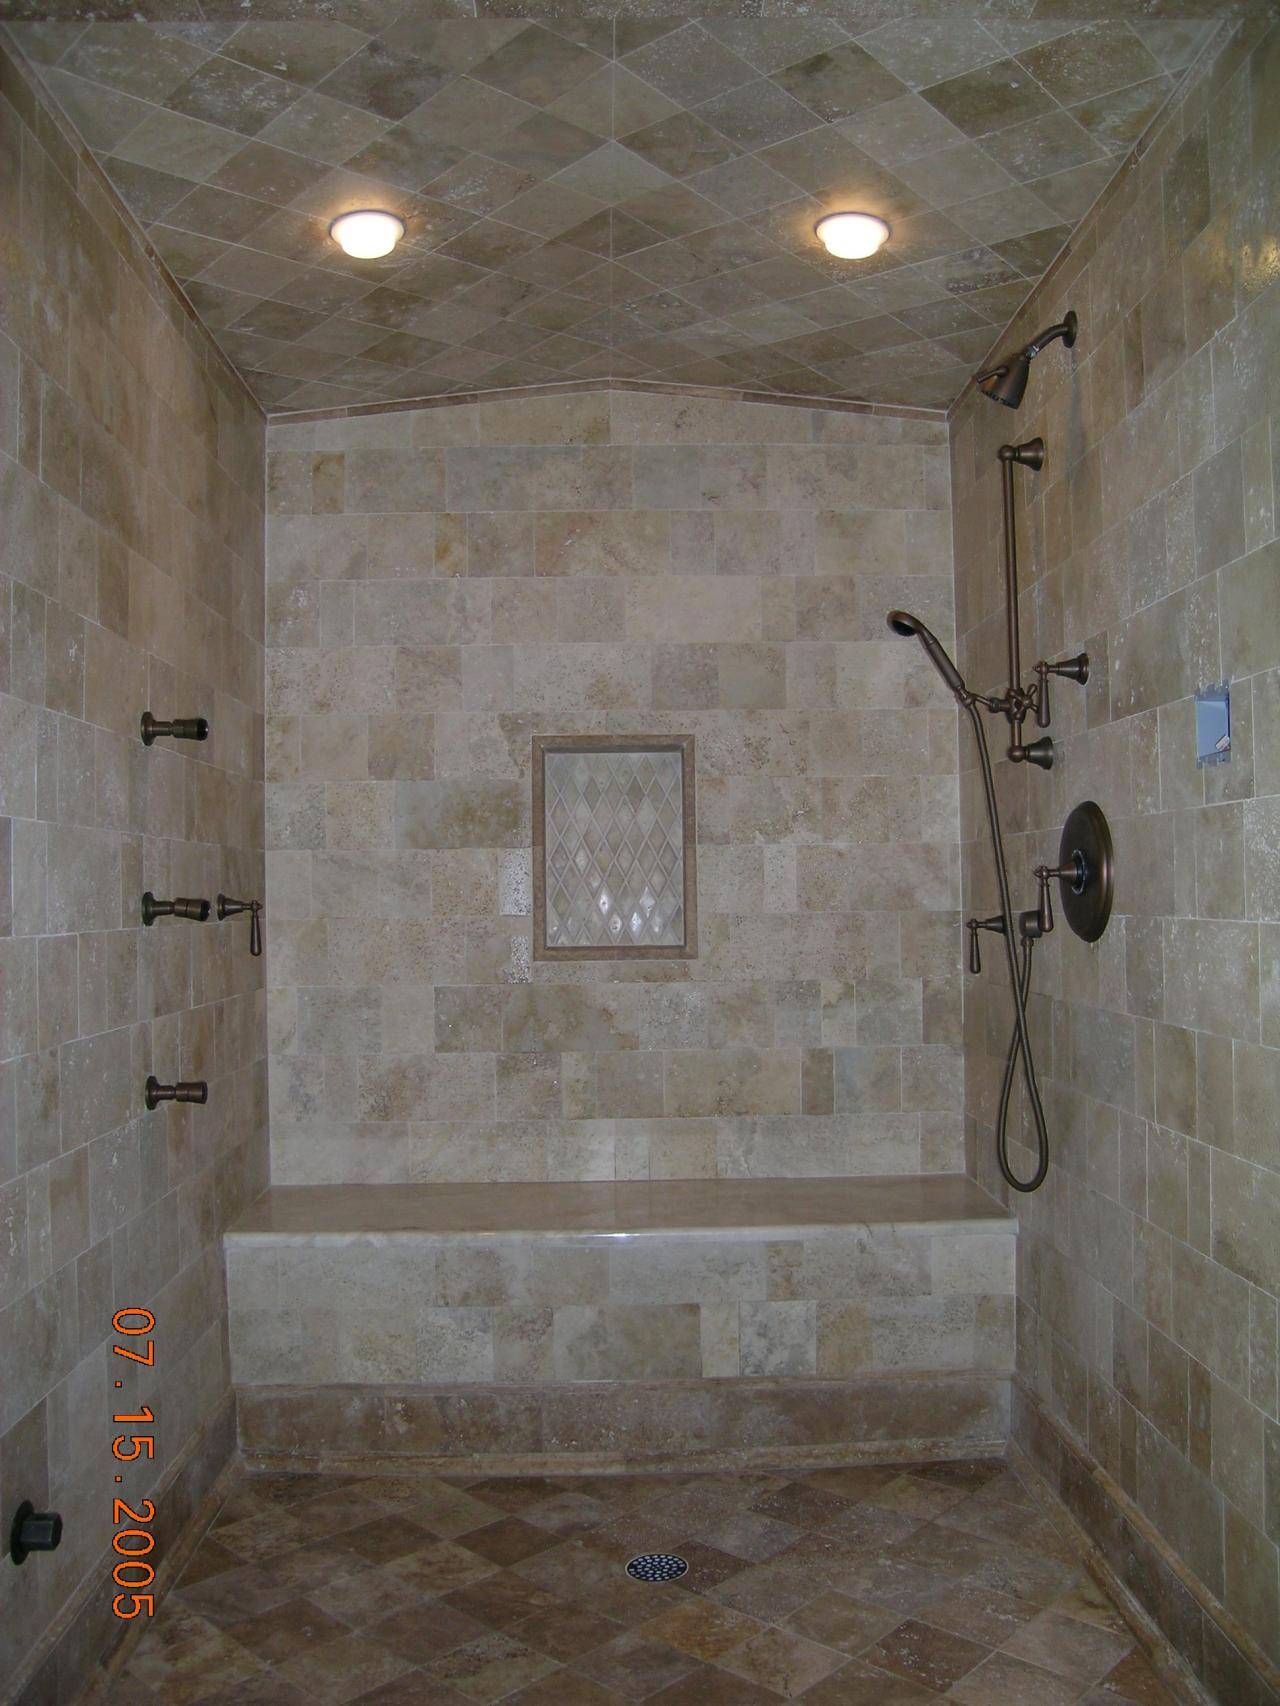 Tile ceiling in shower pranksenders tile ceiling in shower ideas hbm blog ppazfo